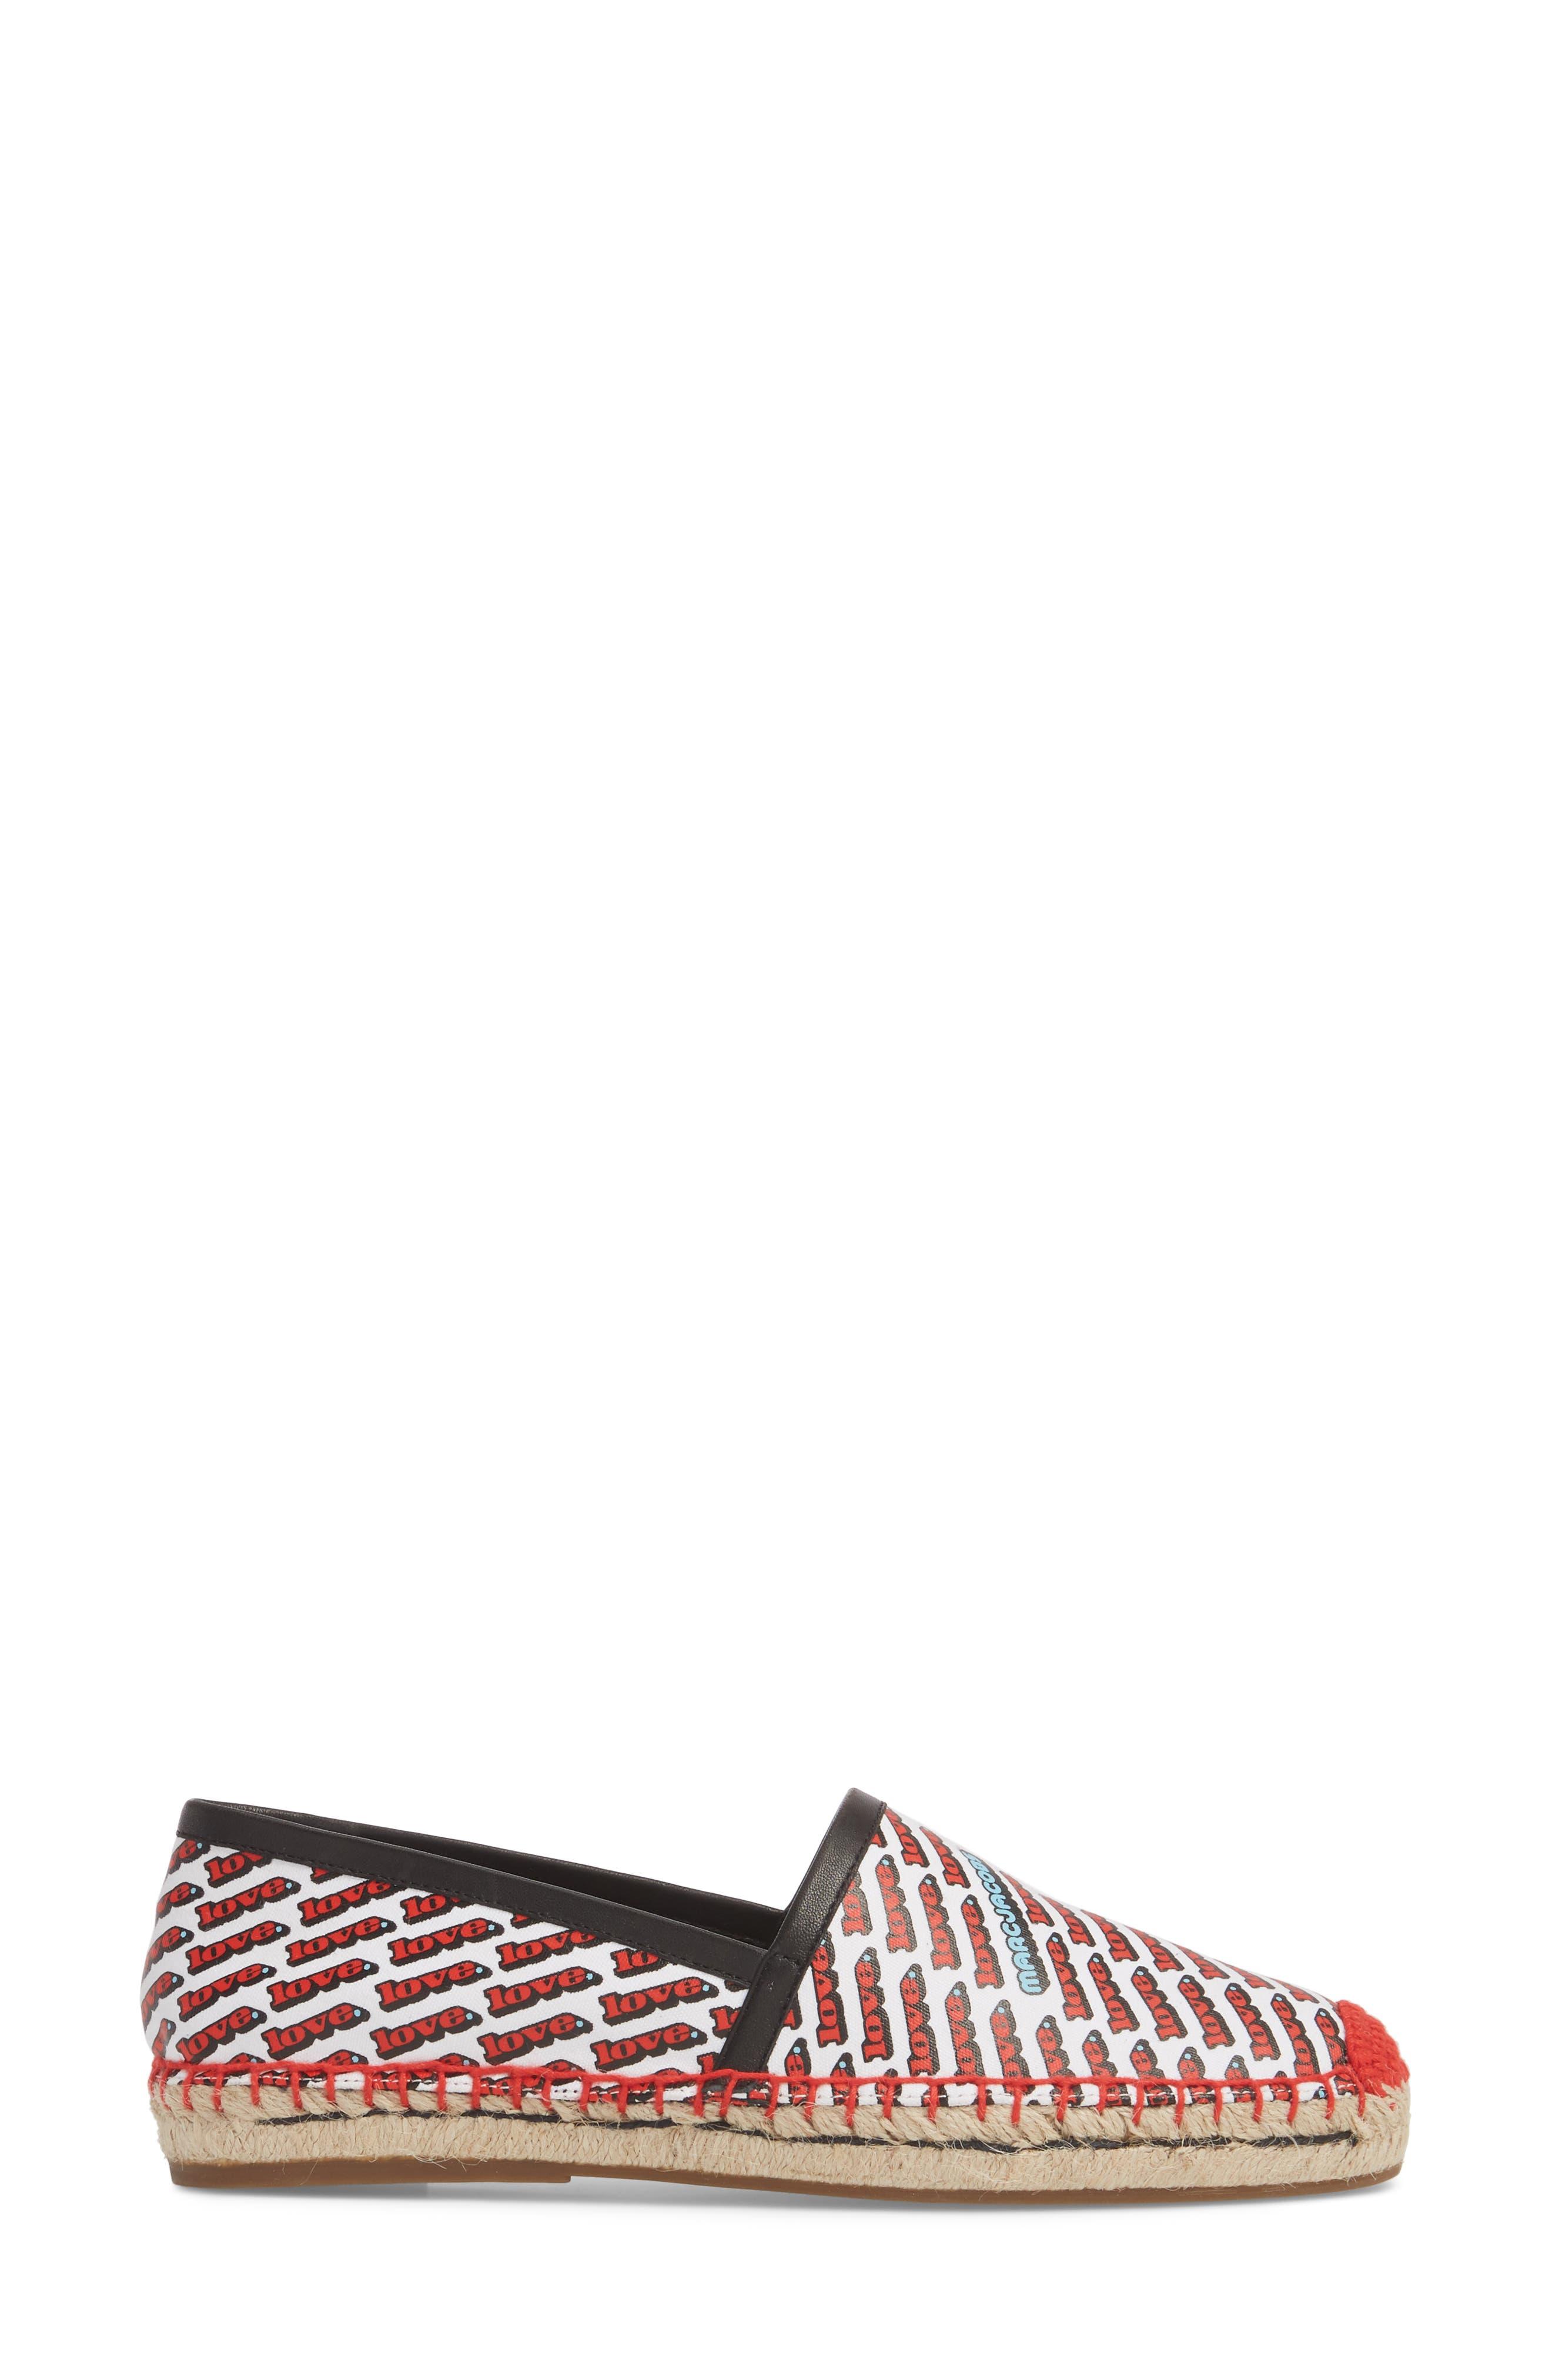 'Sienna' Espadrille Flat,                             Alternate thumbnail 3, color,                             White Multi